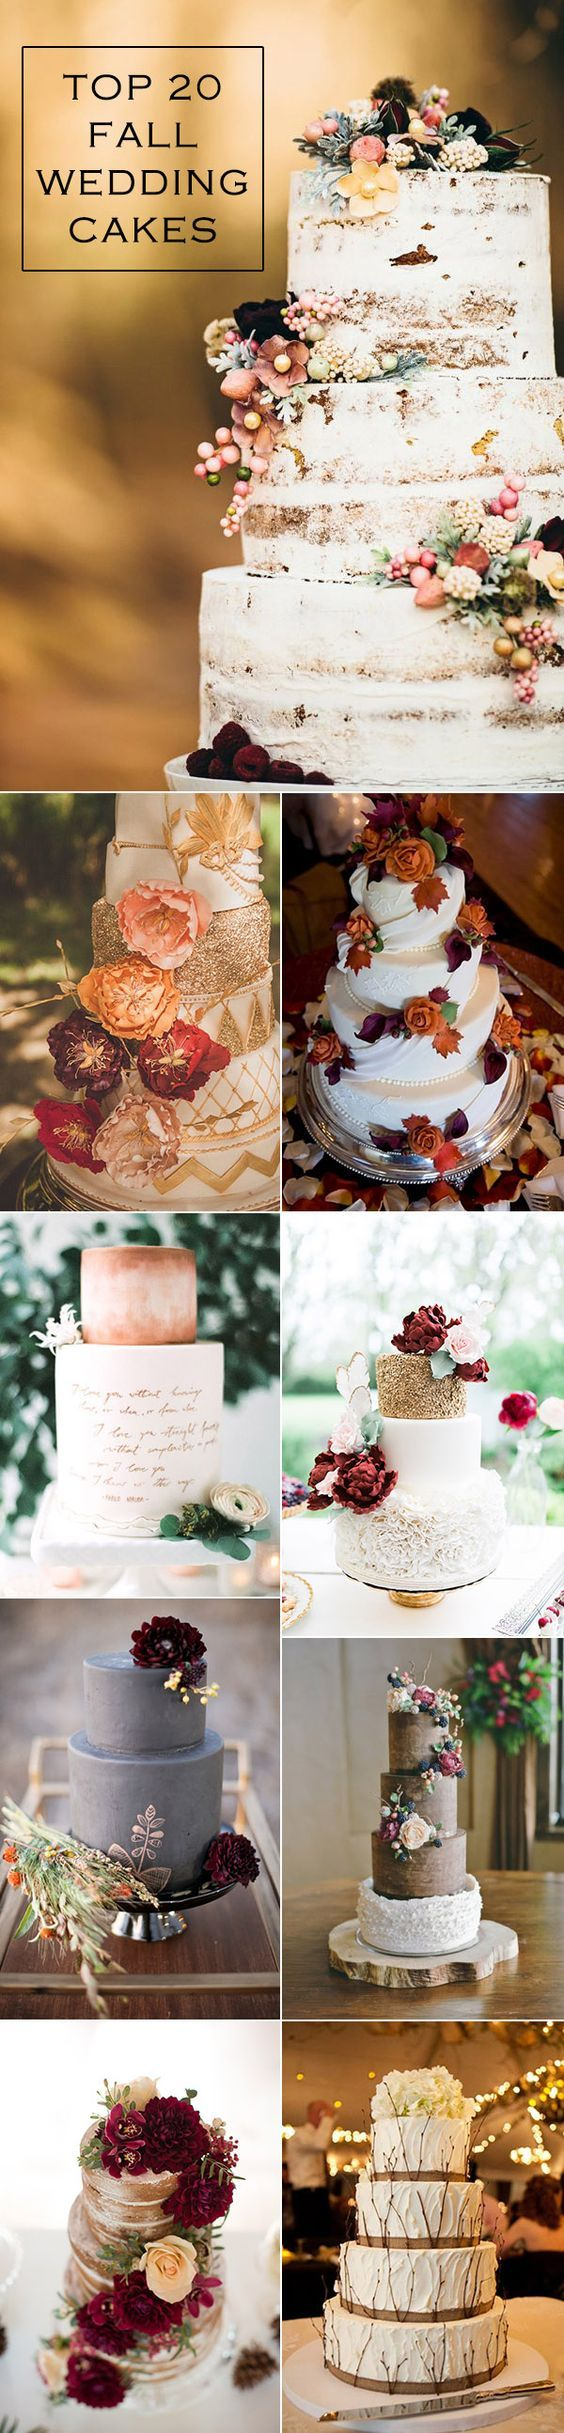 Осенняя свадьба, осенняя палитра, свадебный стиль, свадебные фото, свадебные угощения, autumn wedding, autumn palette, wedding style, wedding photo, wedding dessert